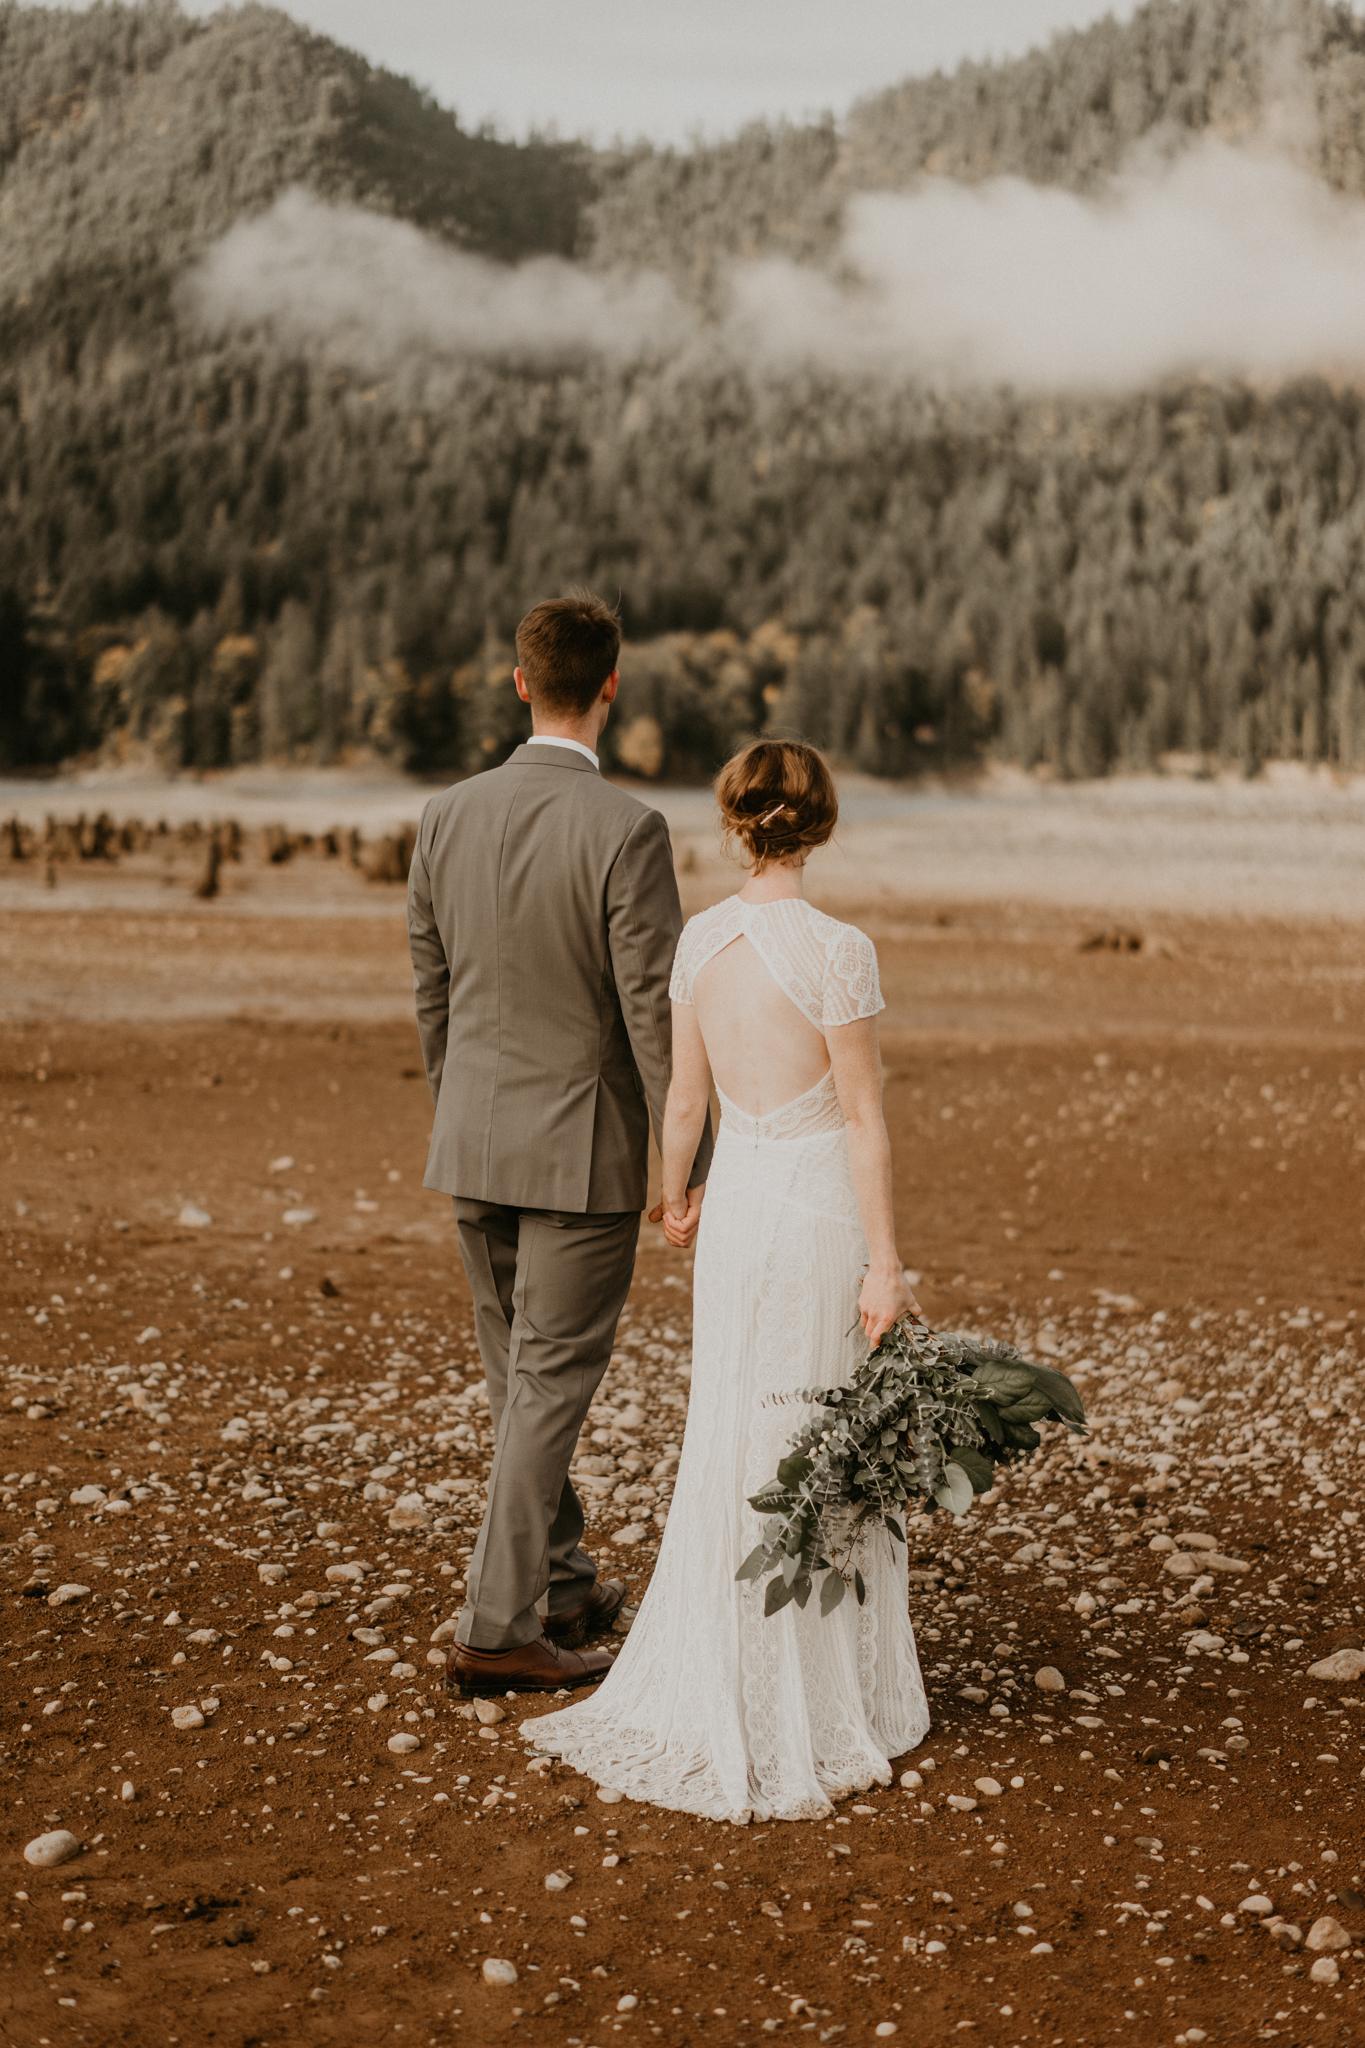 Lake-Cushman-Wedding-Elopement-Engagement-Seattle-Washington-PNW-Adventure-Nature-Photographer-14.jpg